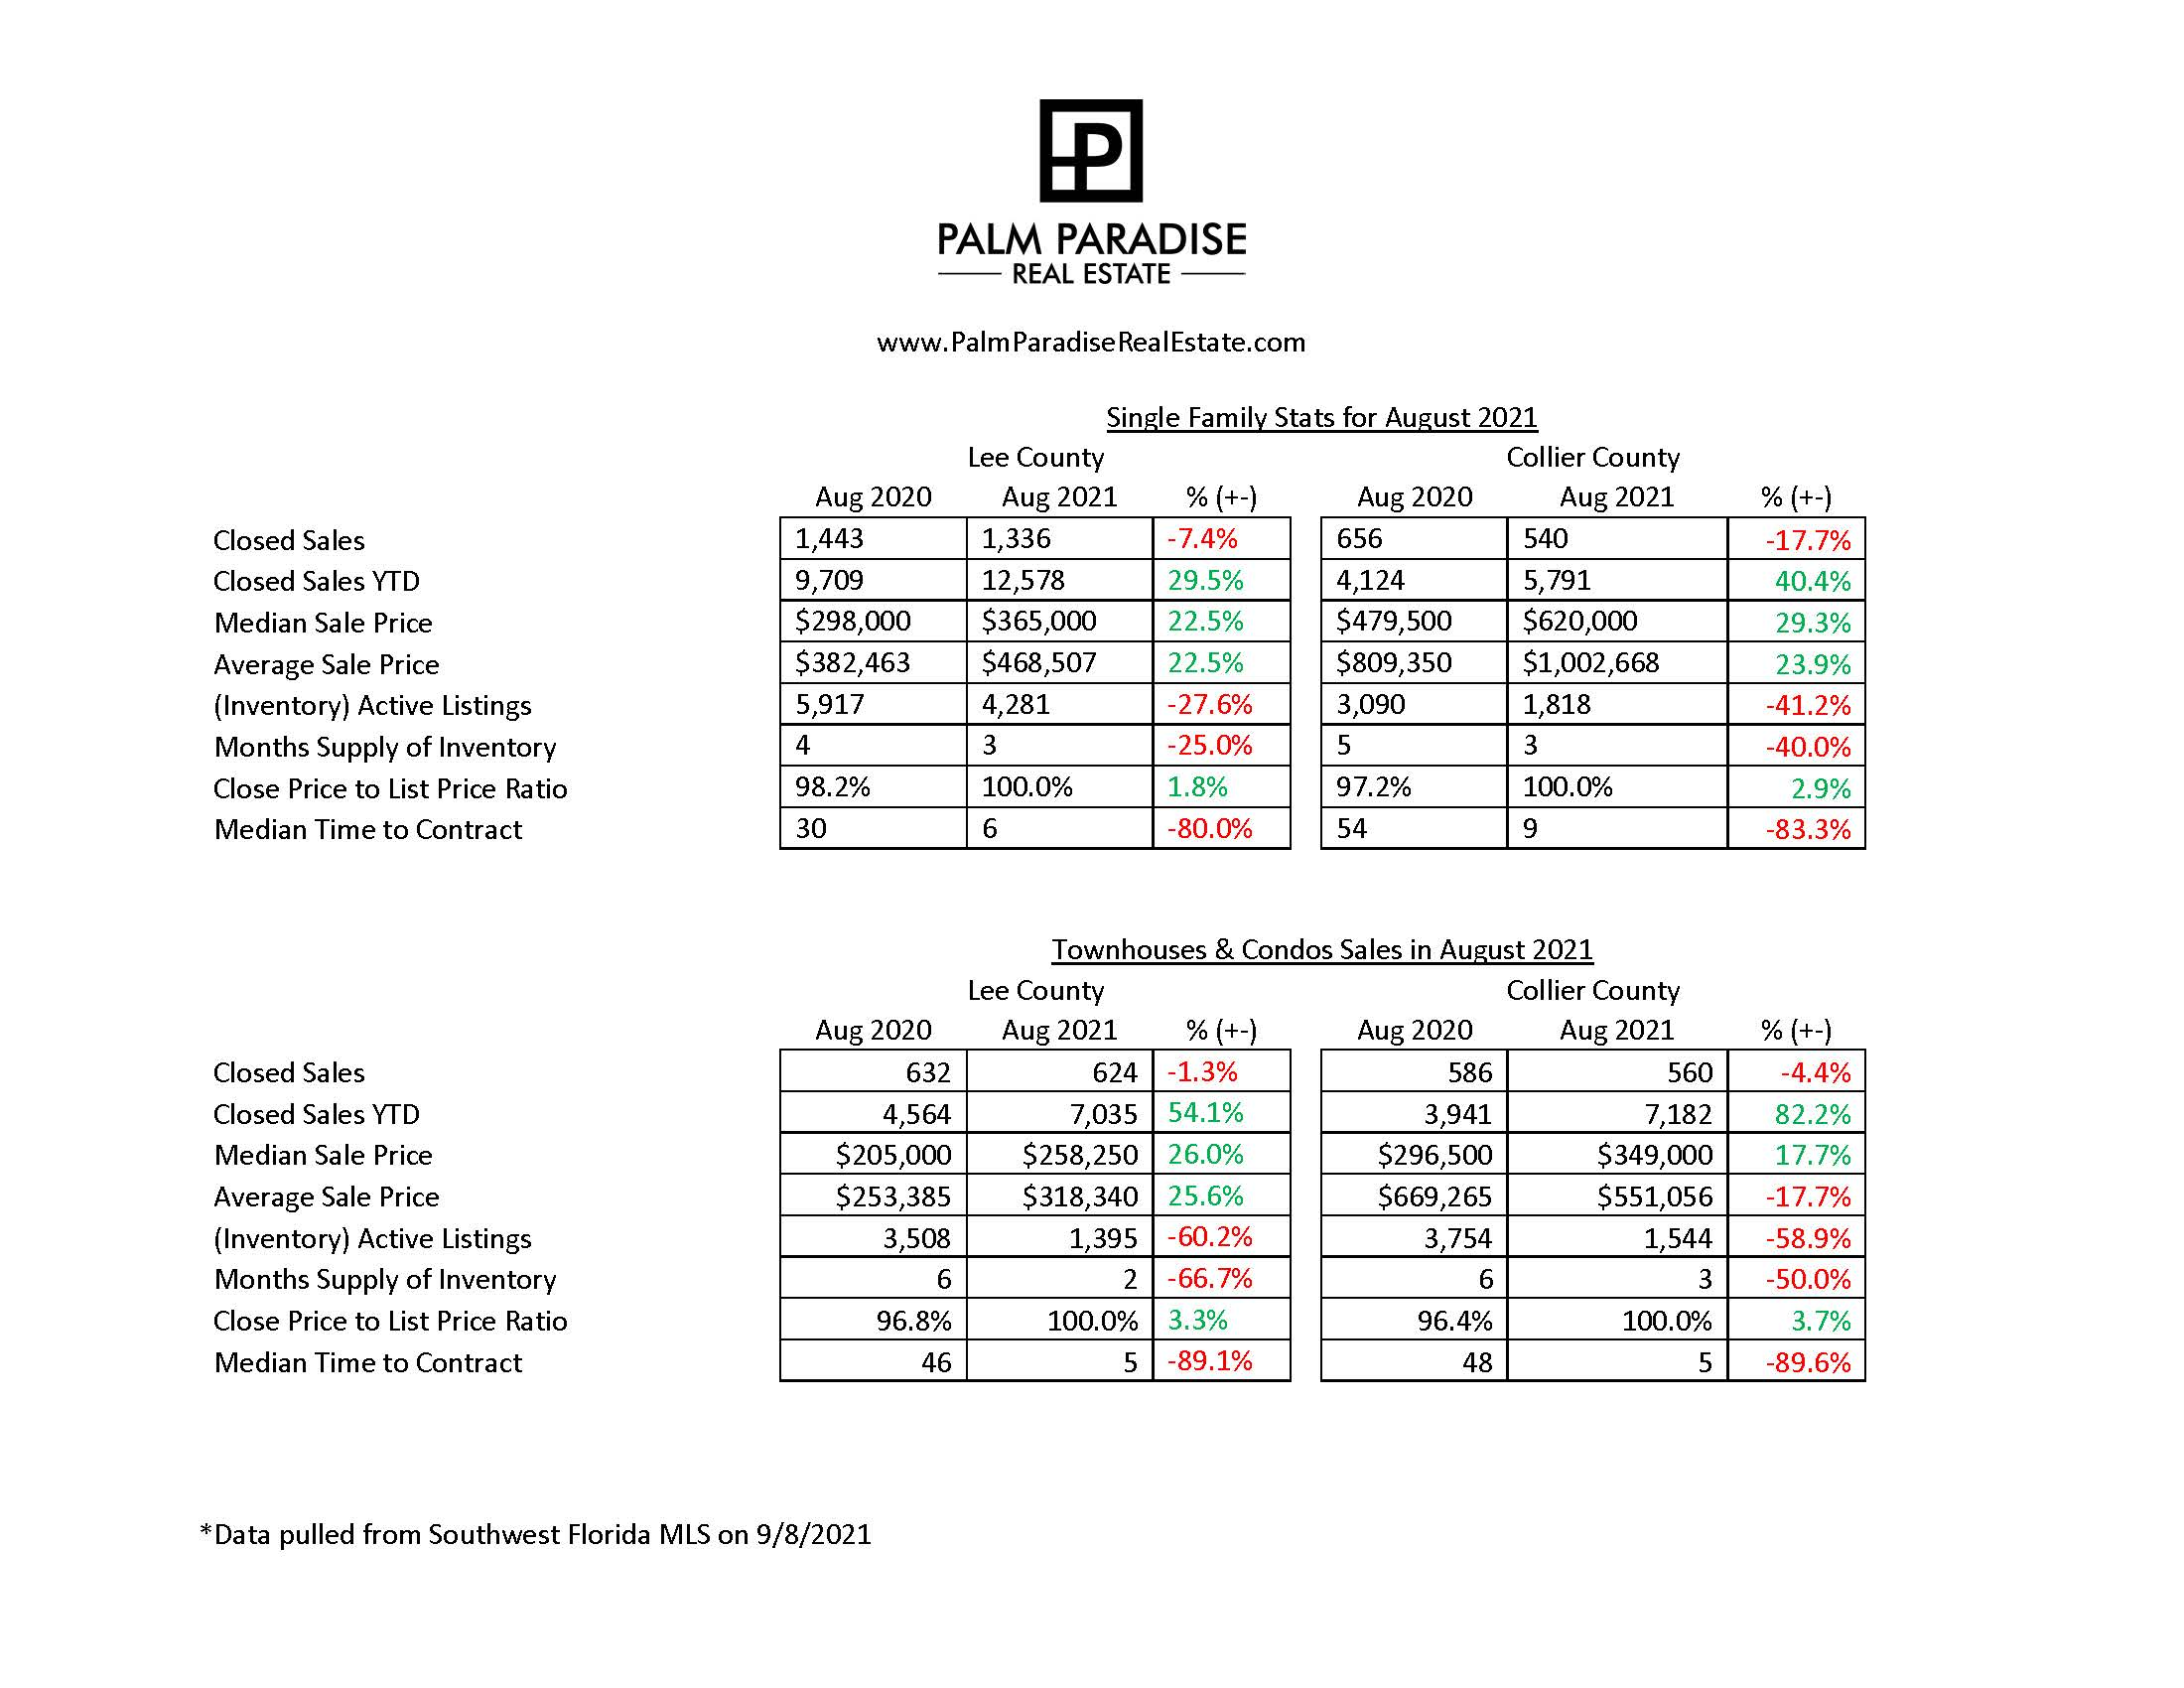 August 2021 Market Stats